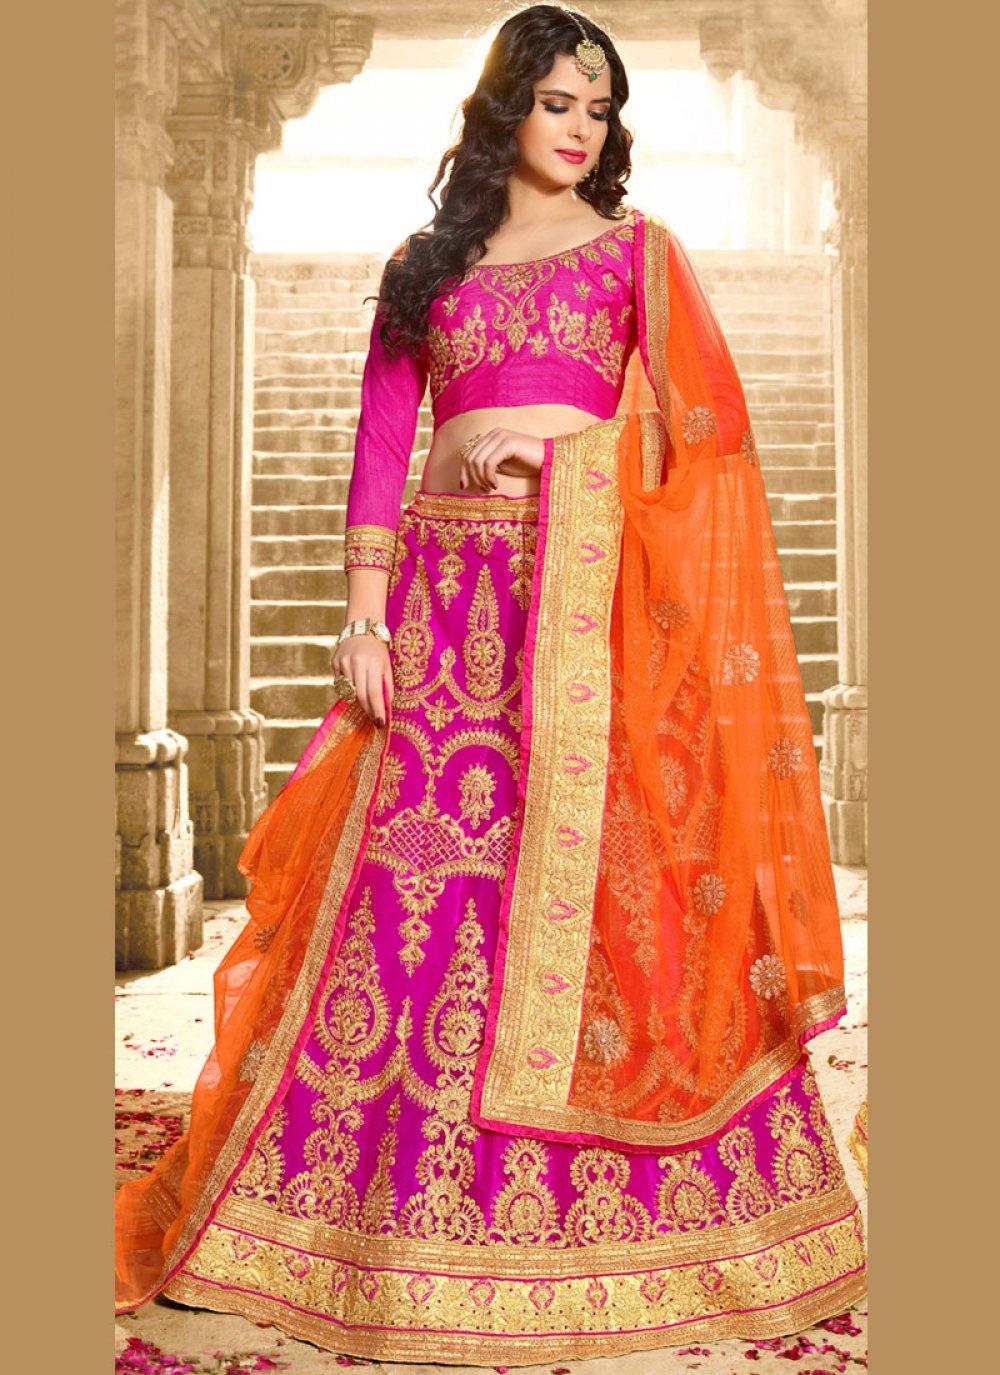 Hot Pink Lace Work Lehenga Choli